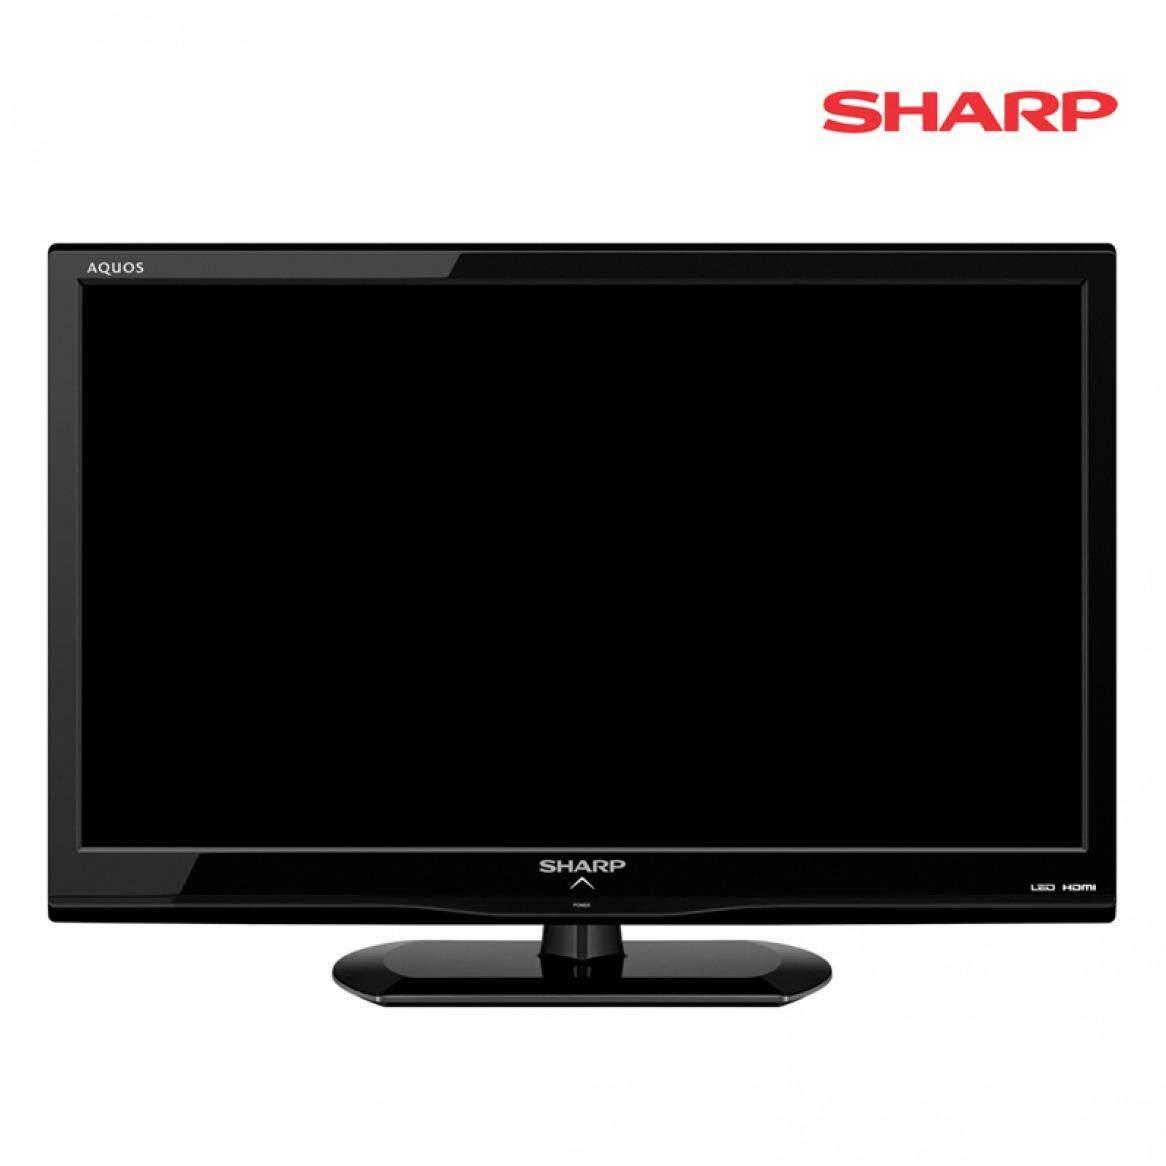 Led Tv Sharp Tv 24 รุ่น Lc24Le150M Usb รับประกัน1ปี ใน กรุงเทพมหานคร